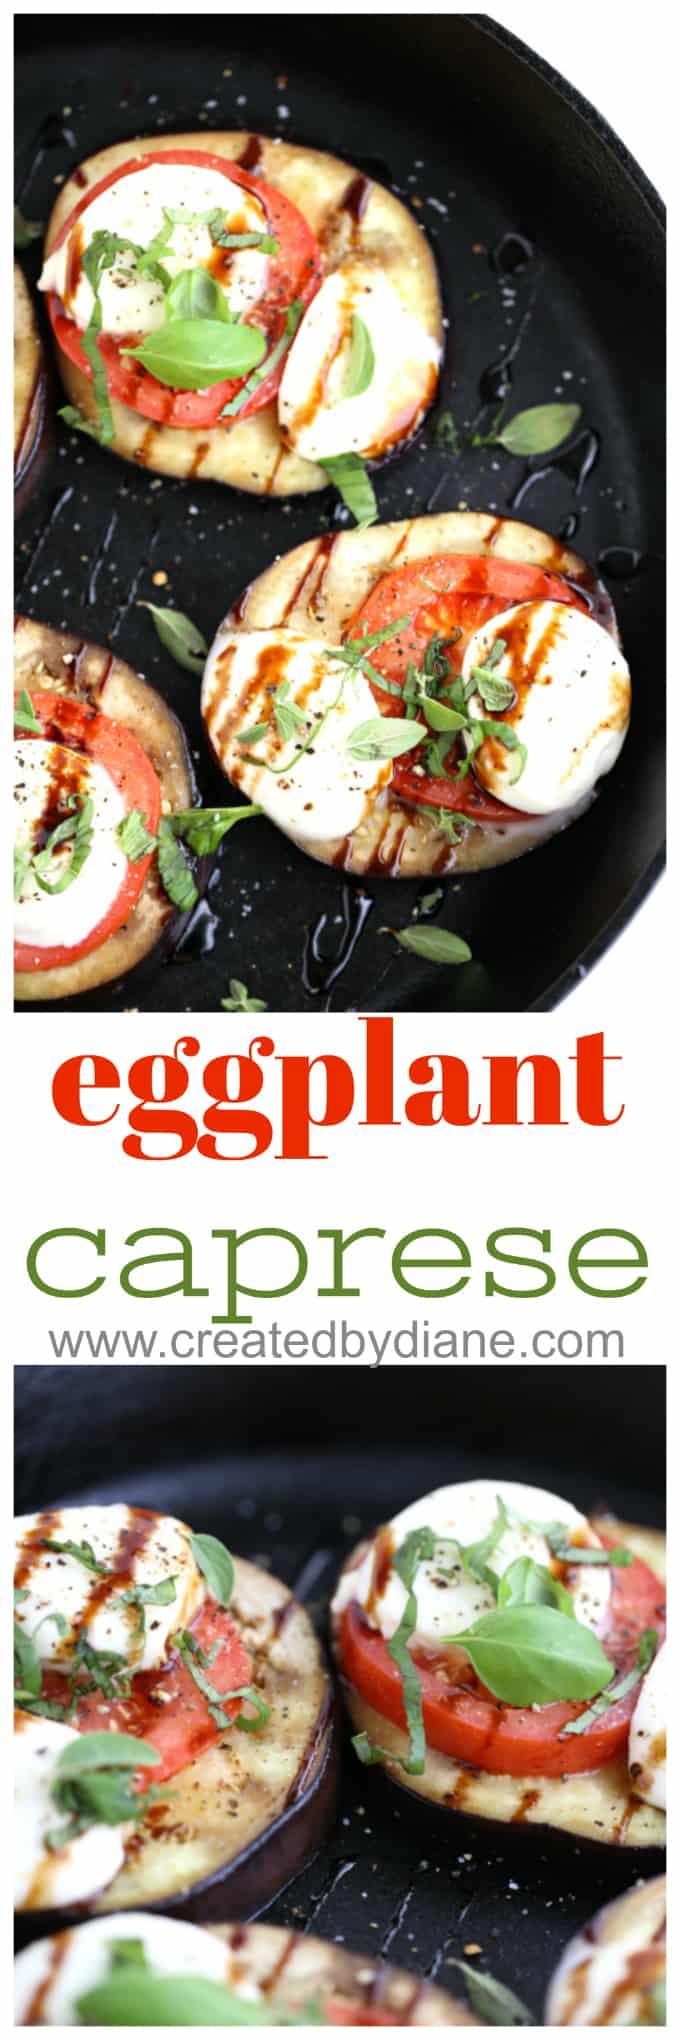 eggplant caprese www.createdbydiane.com #eggplant #vegetarian #caprese #castiron